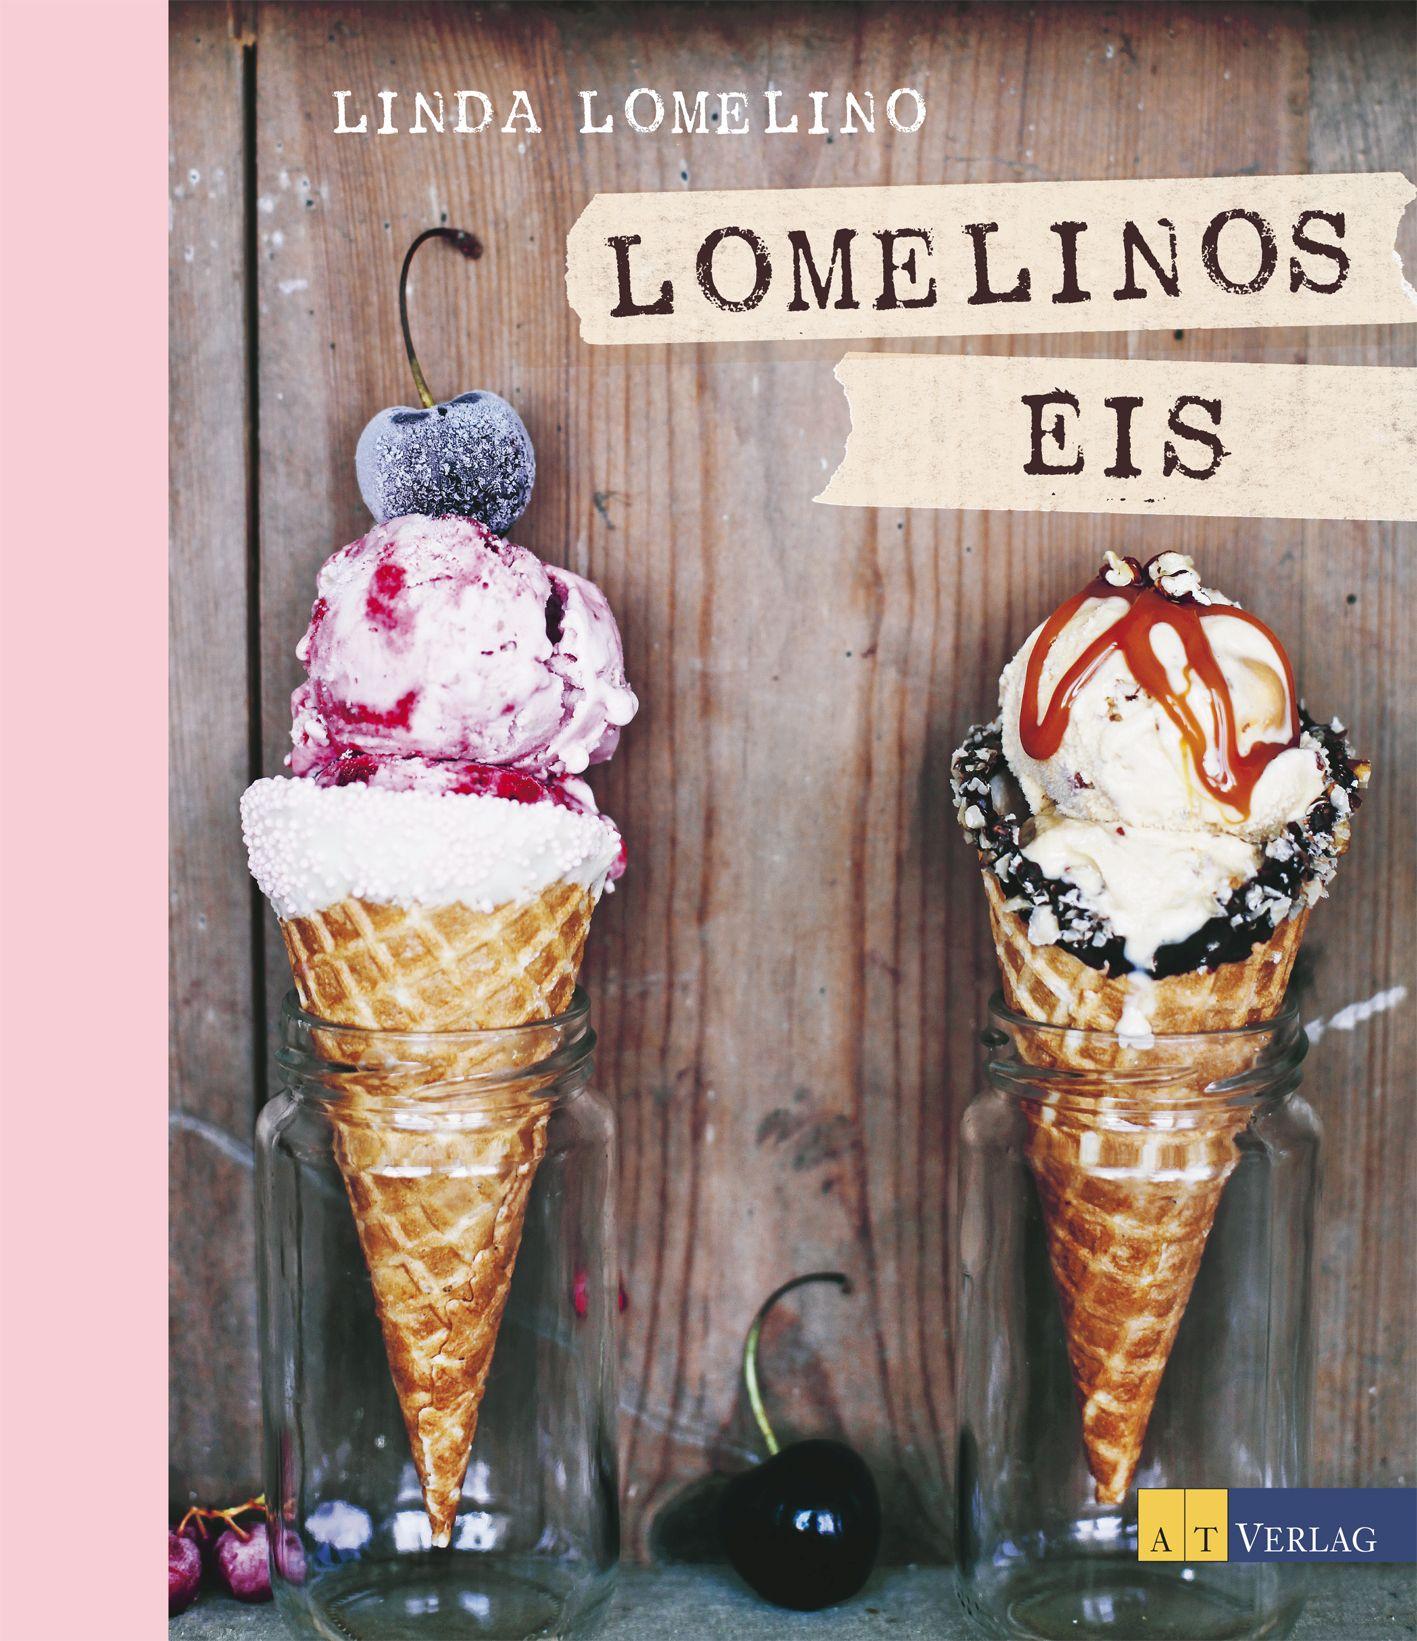 Lomelinos Eis © AT Verlag